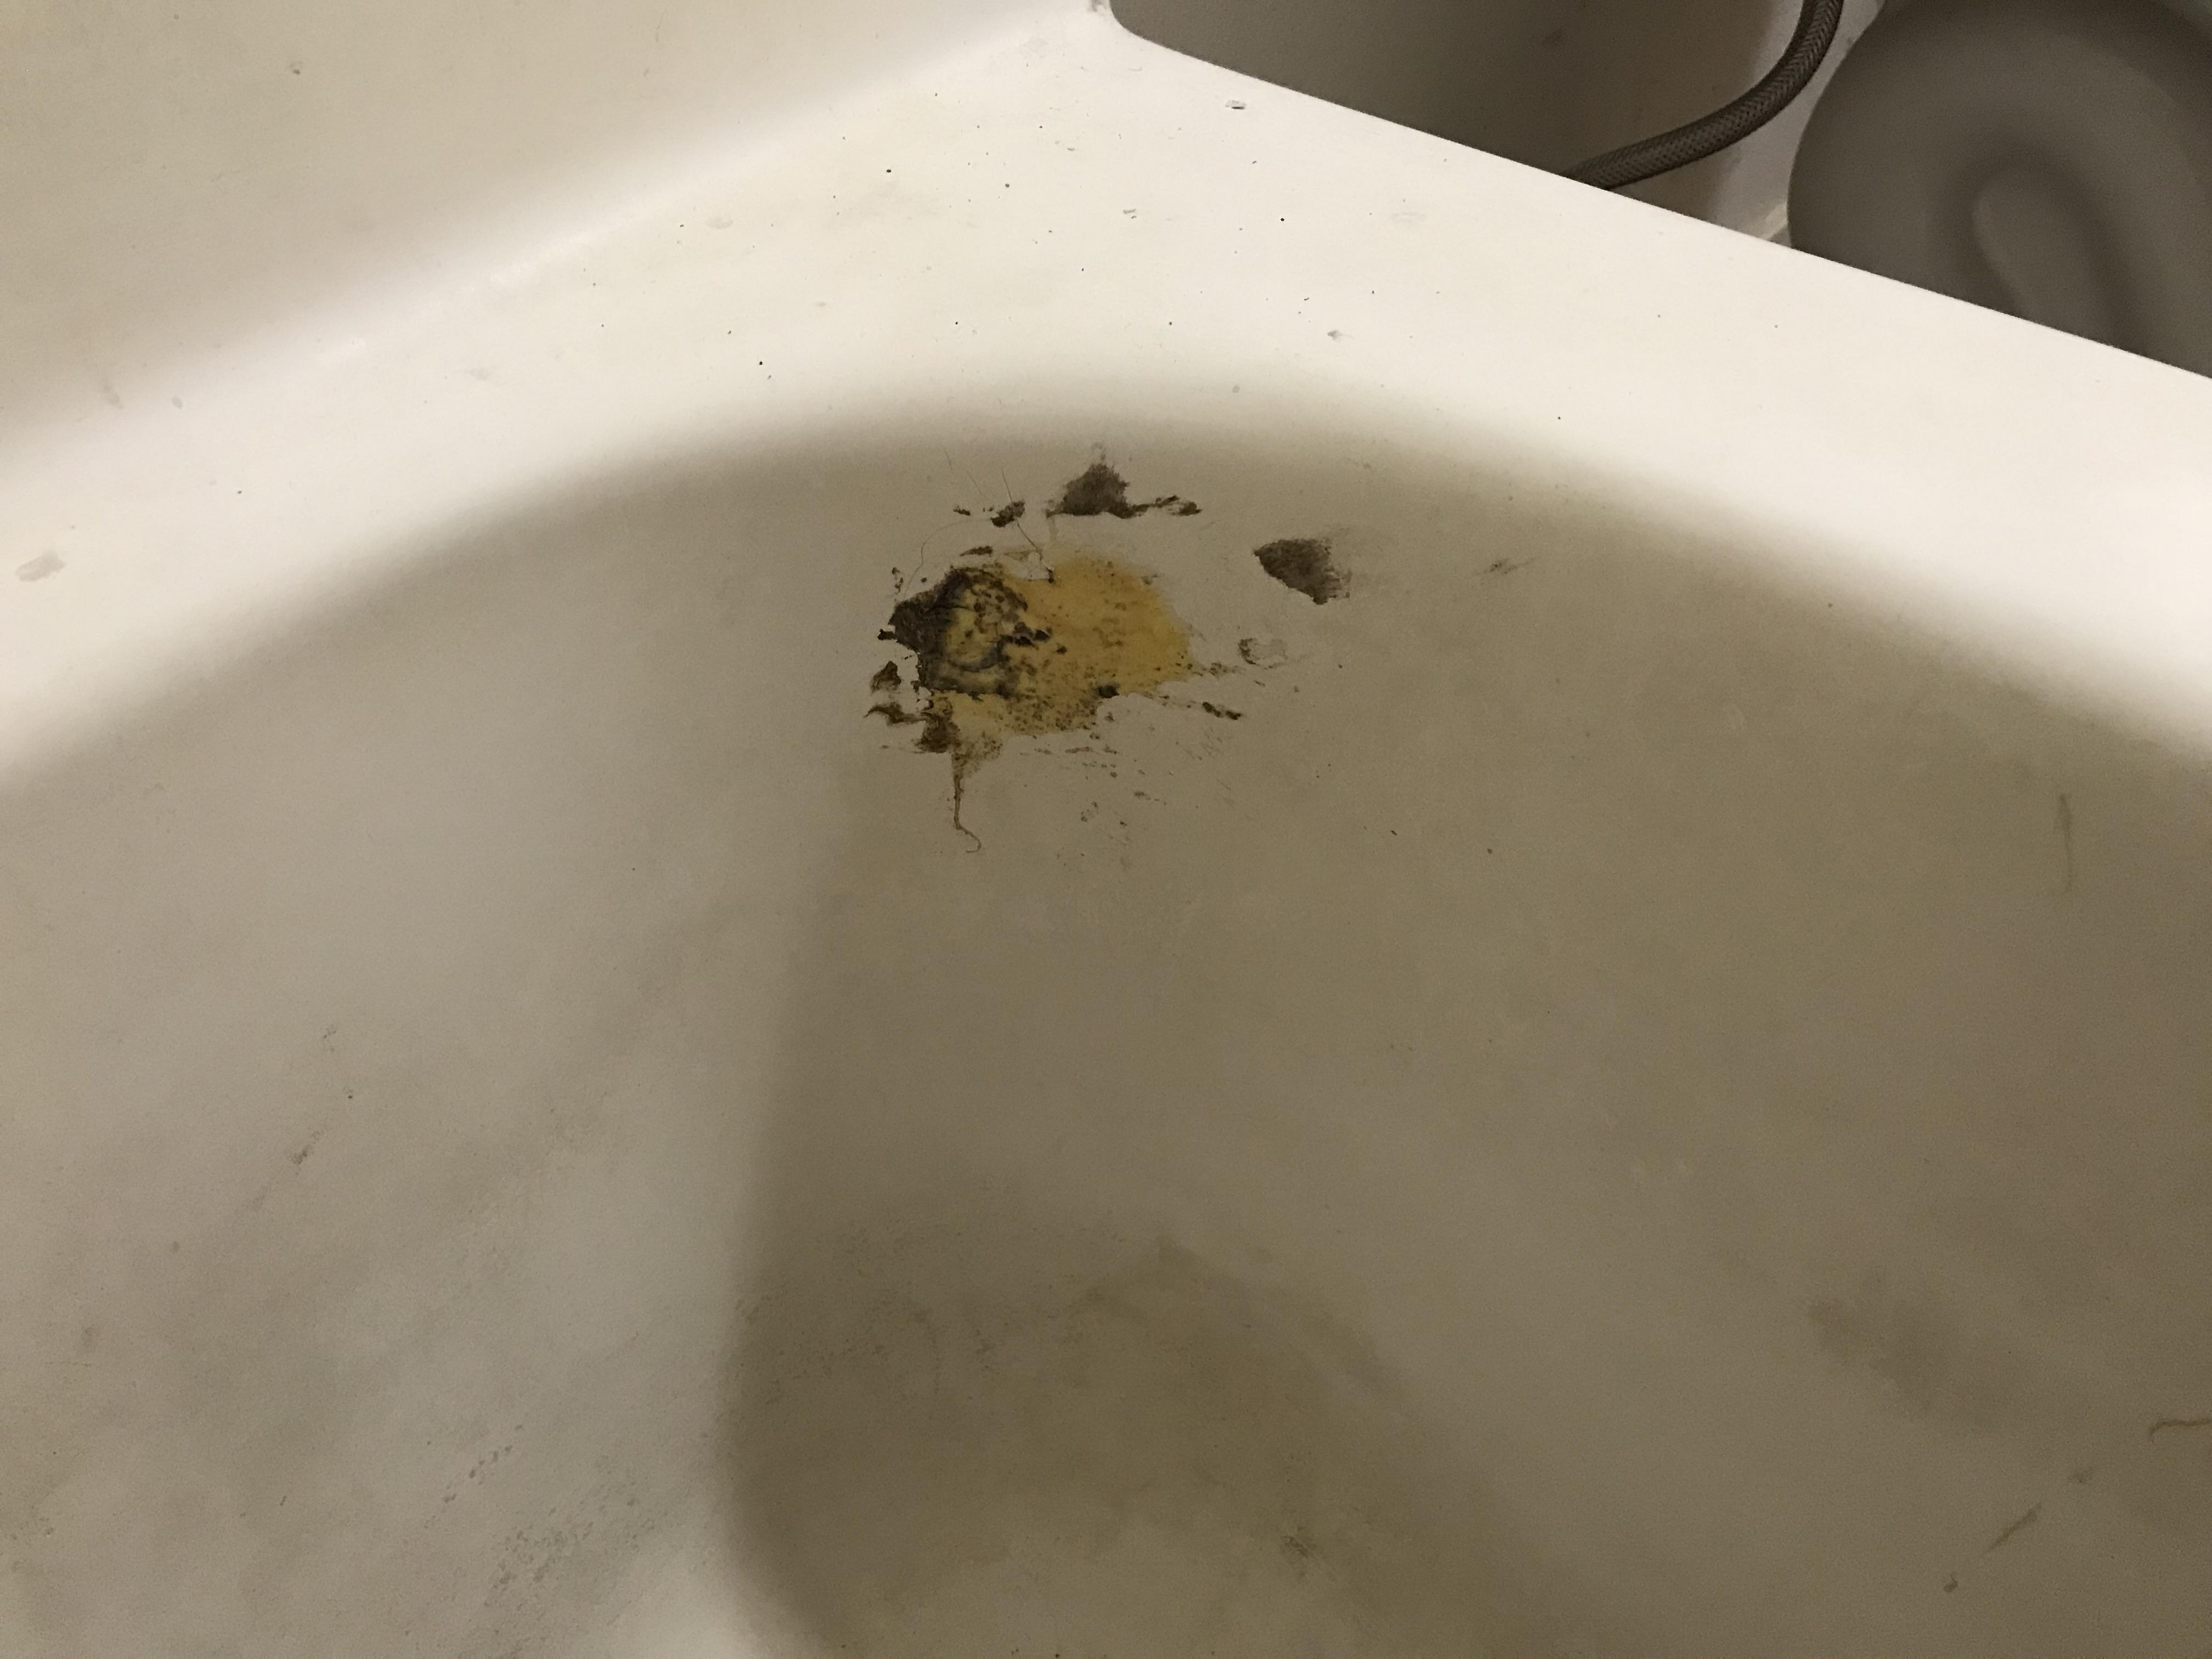 Bathtub Refinishing Before Spot Repair - NuFinishPro